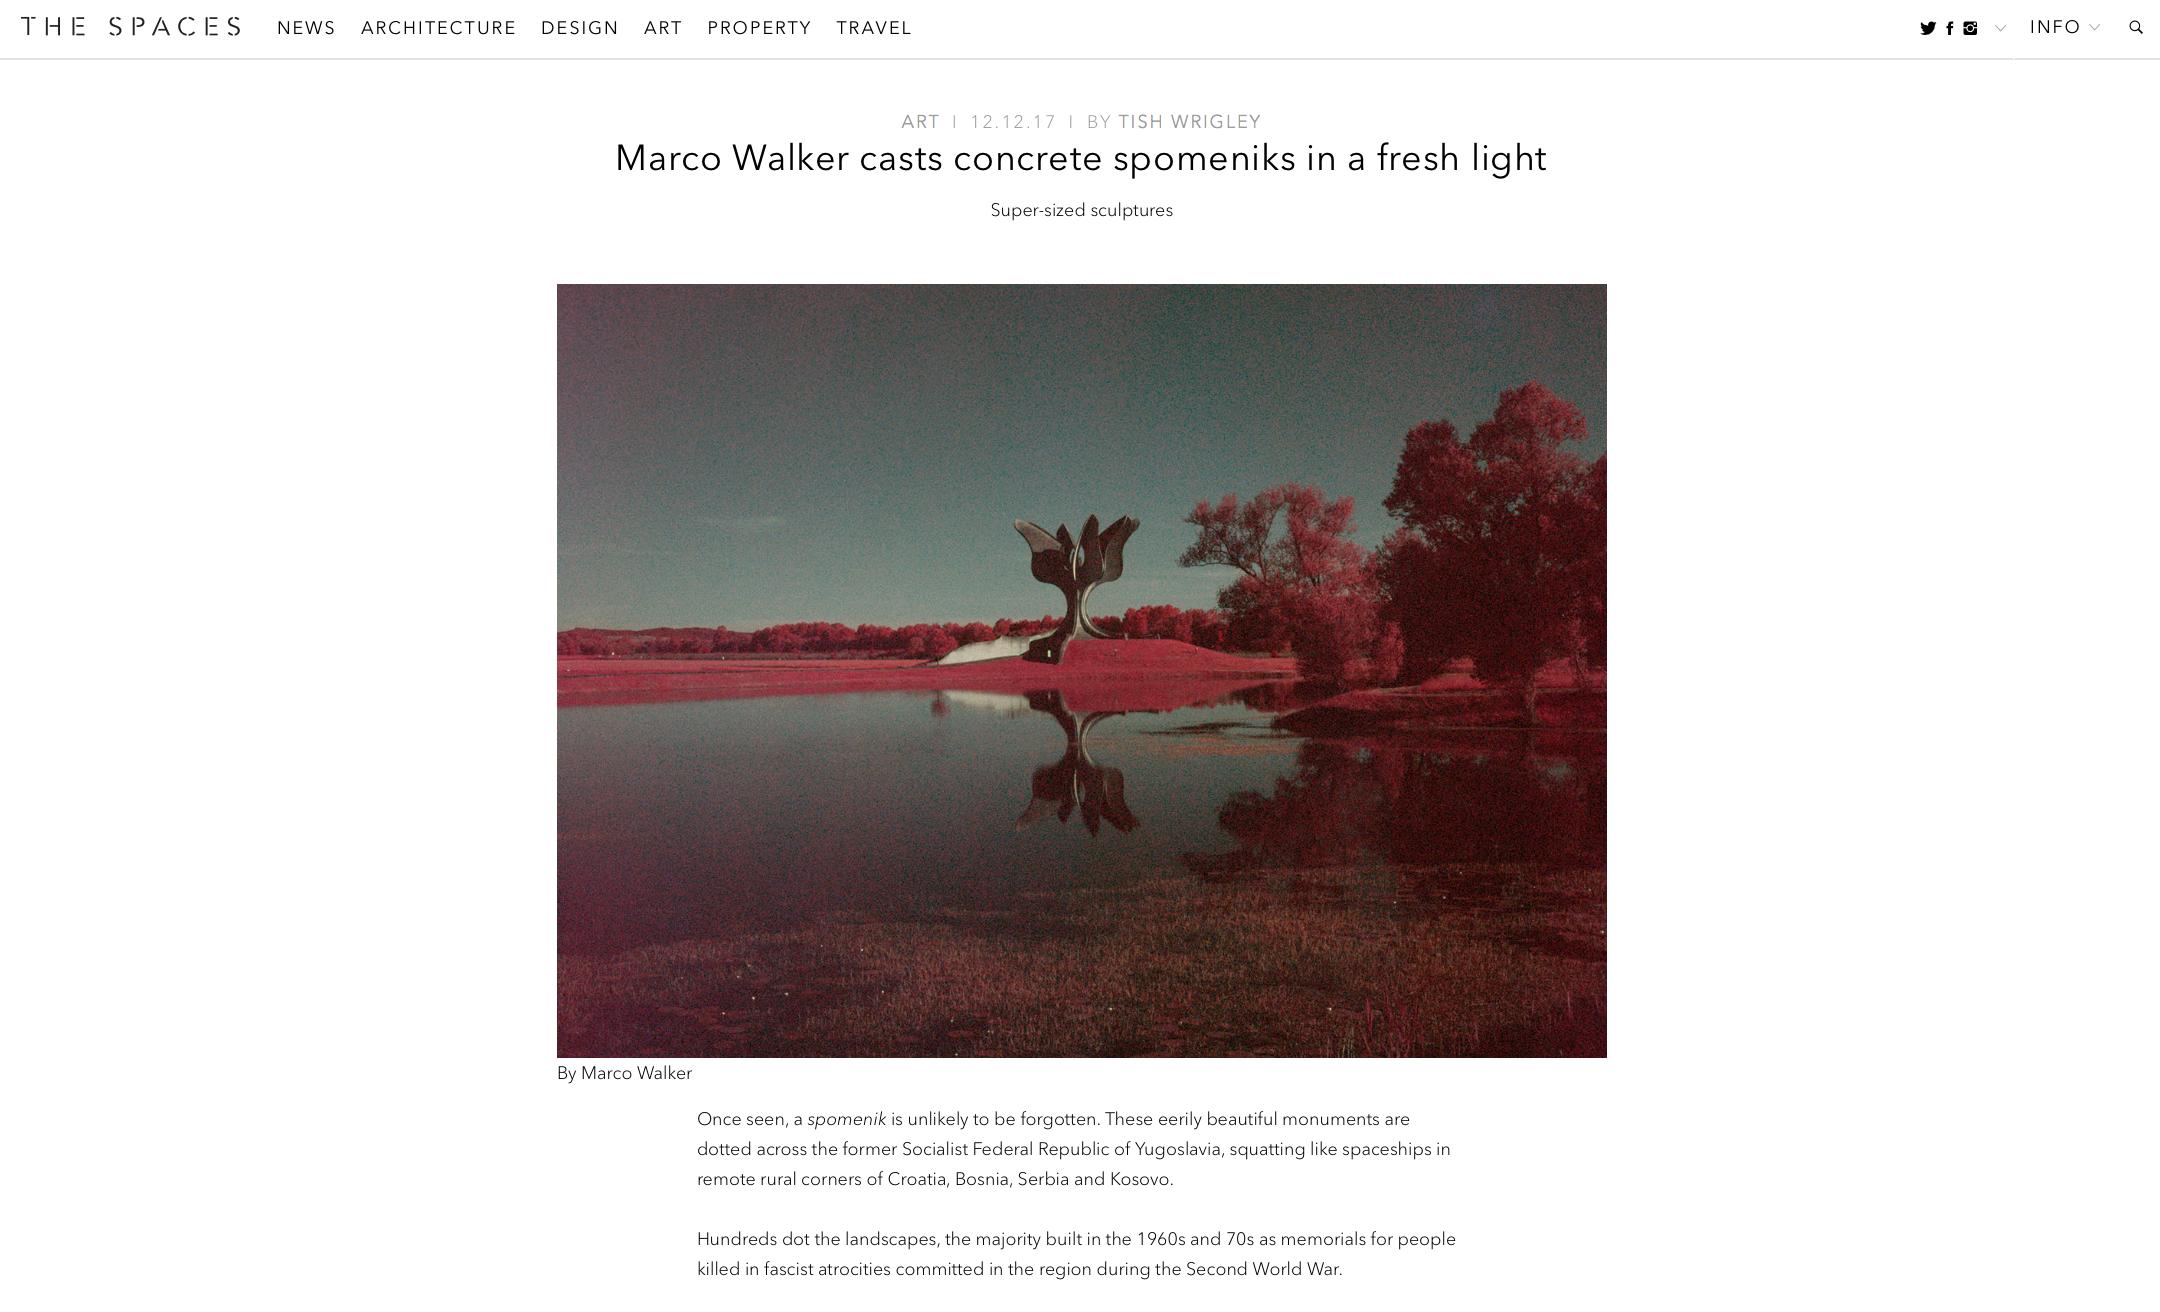 MarcoWalker_Press_004.png